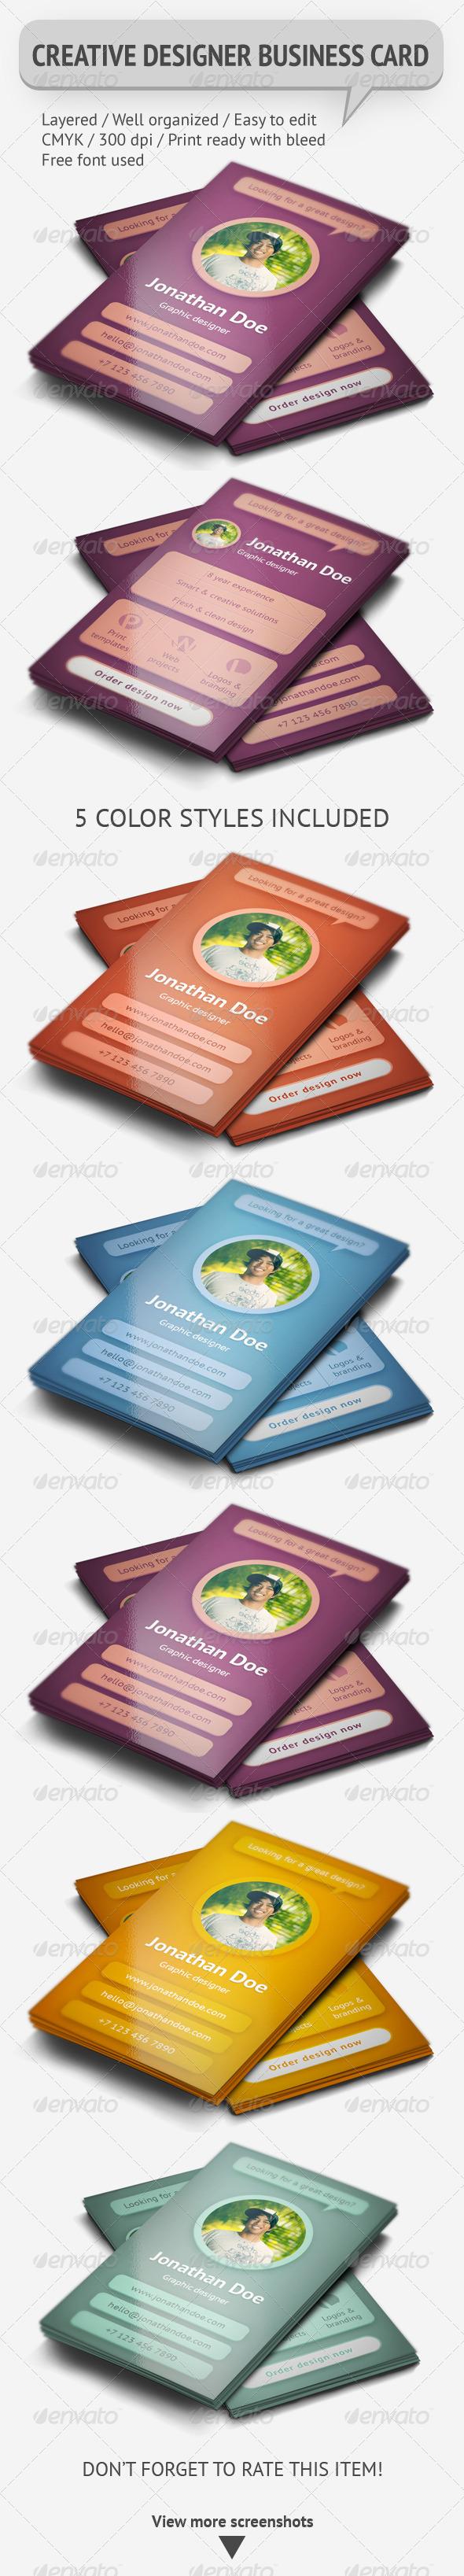 GraphicRiver Creative Graphic Designer Business Card 5179437